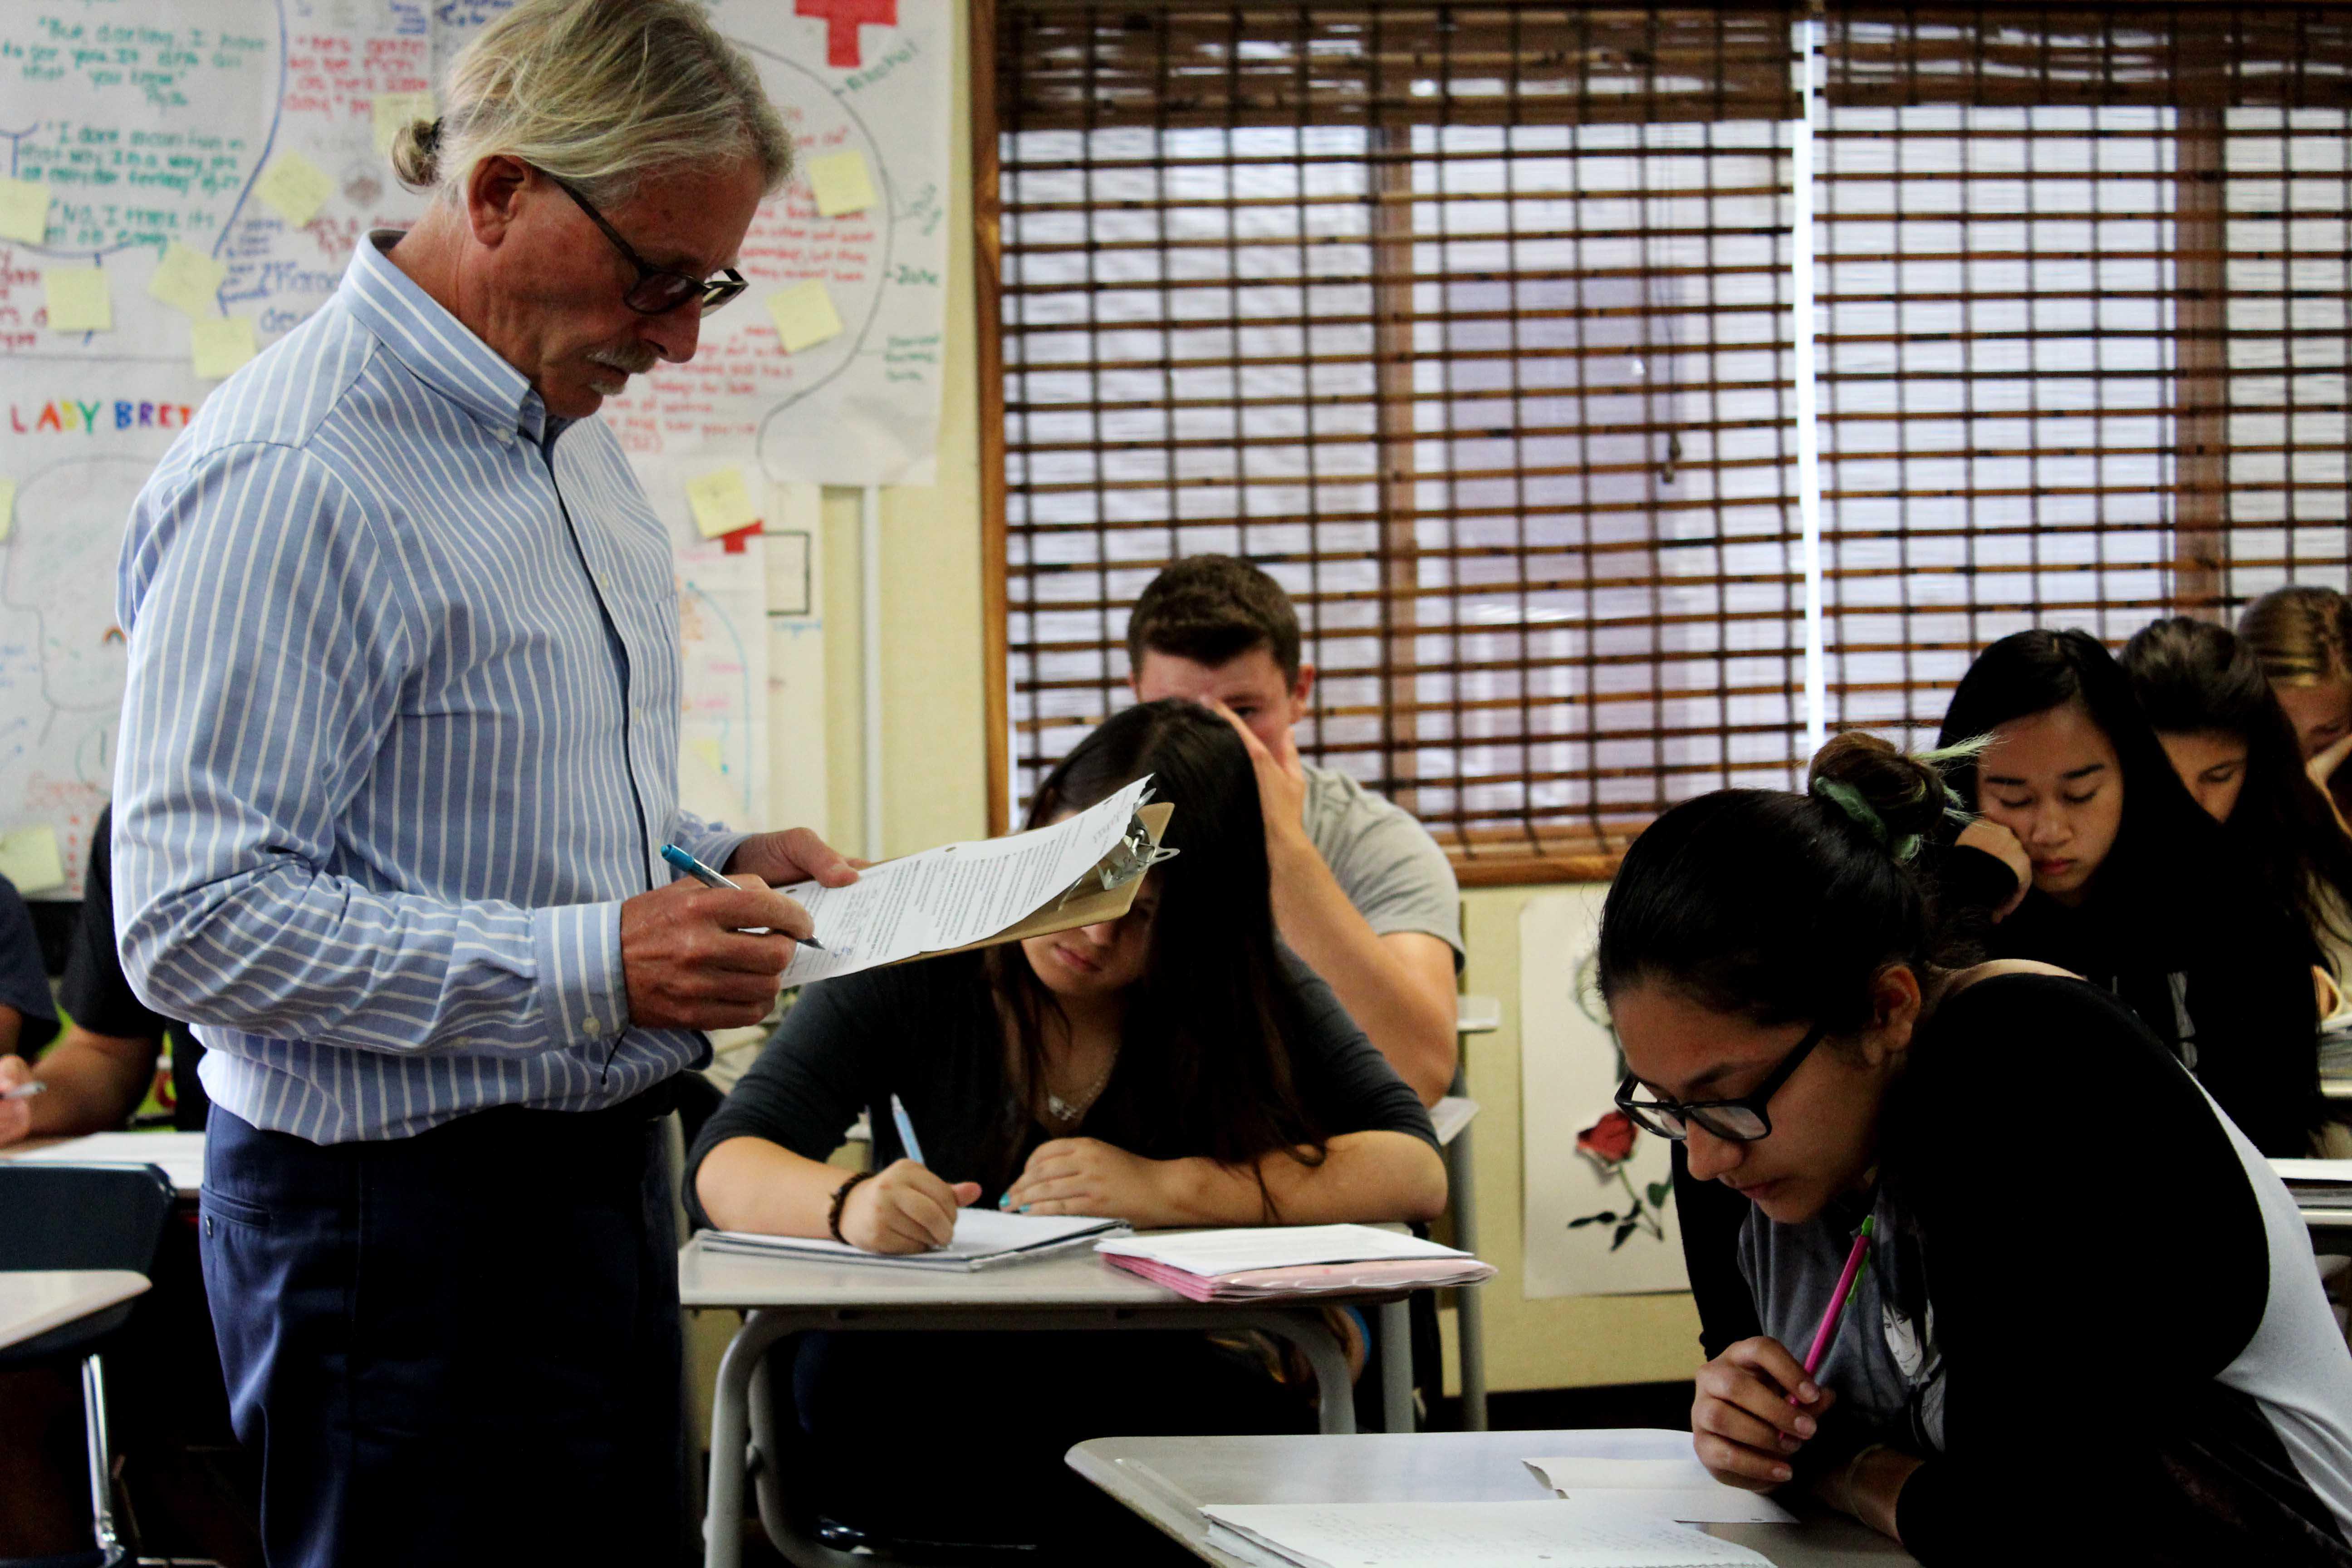 Mr. Kevin Buddhu reviews his English 3 class' homework assignments.